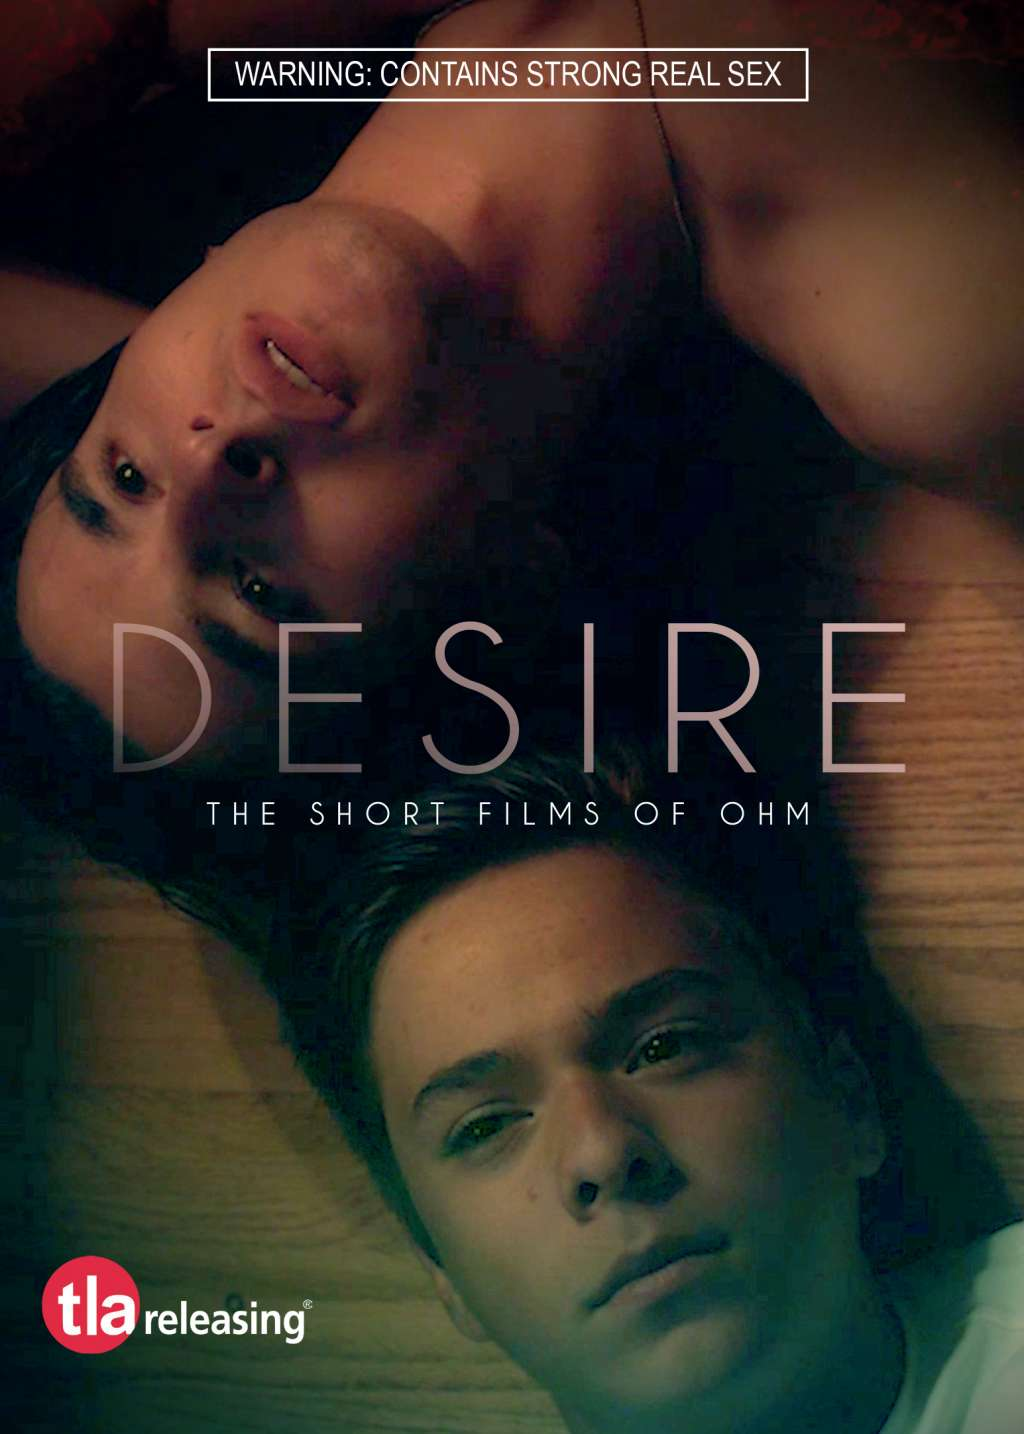 Desire: The Short Films of Ohm kapak